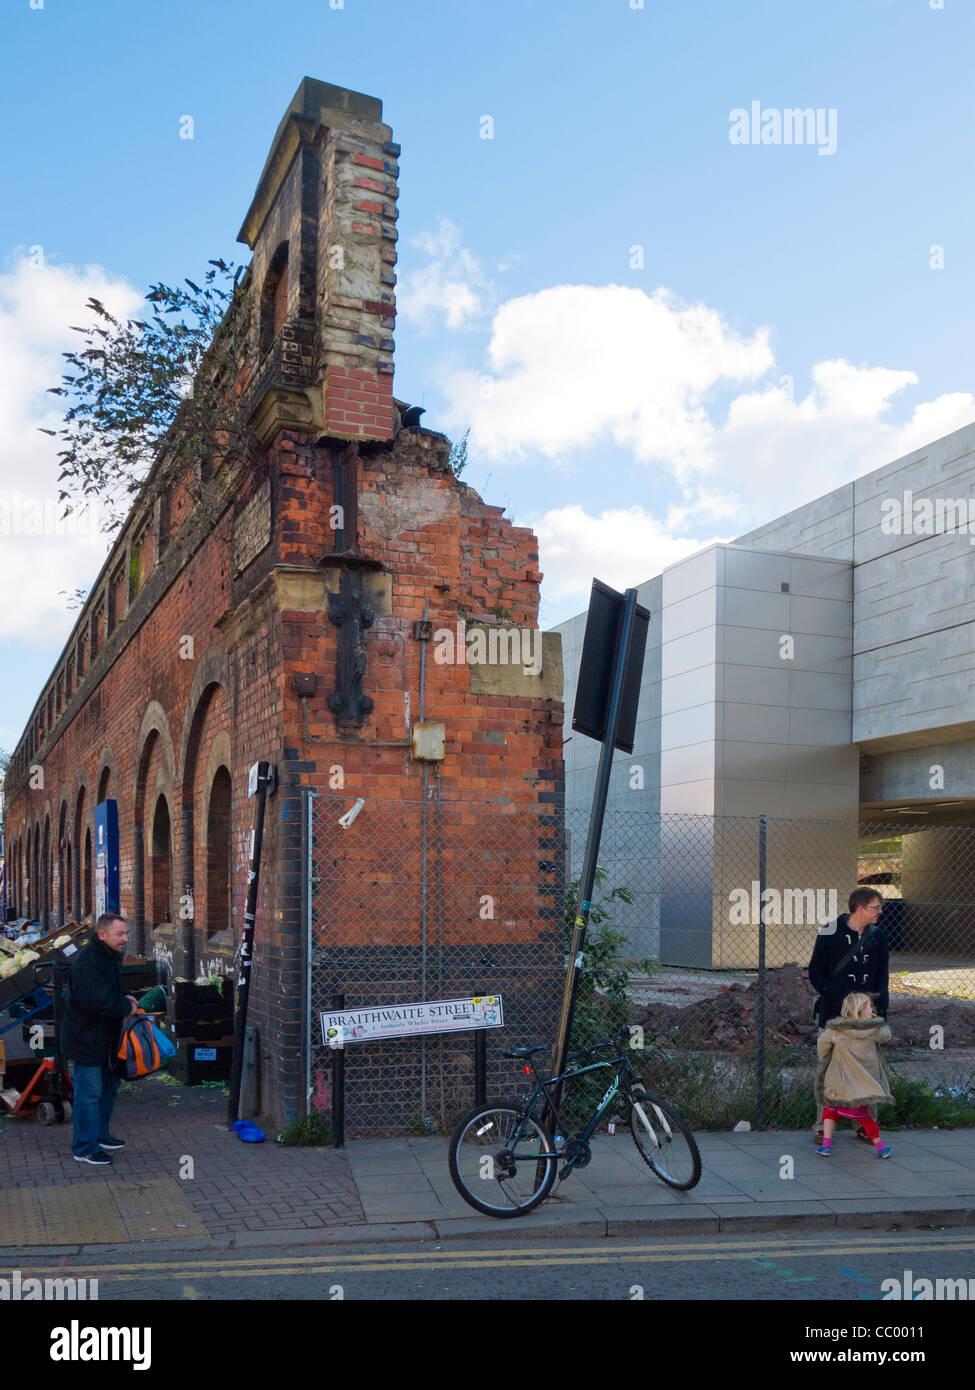 Shoreditch High Street: Braithwaite Stock Photos & Braithwaite Stock Images